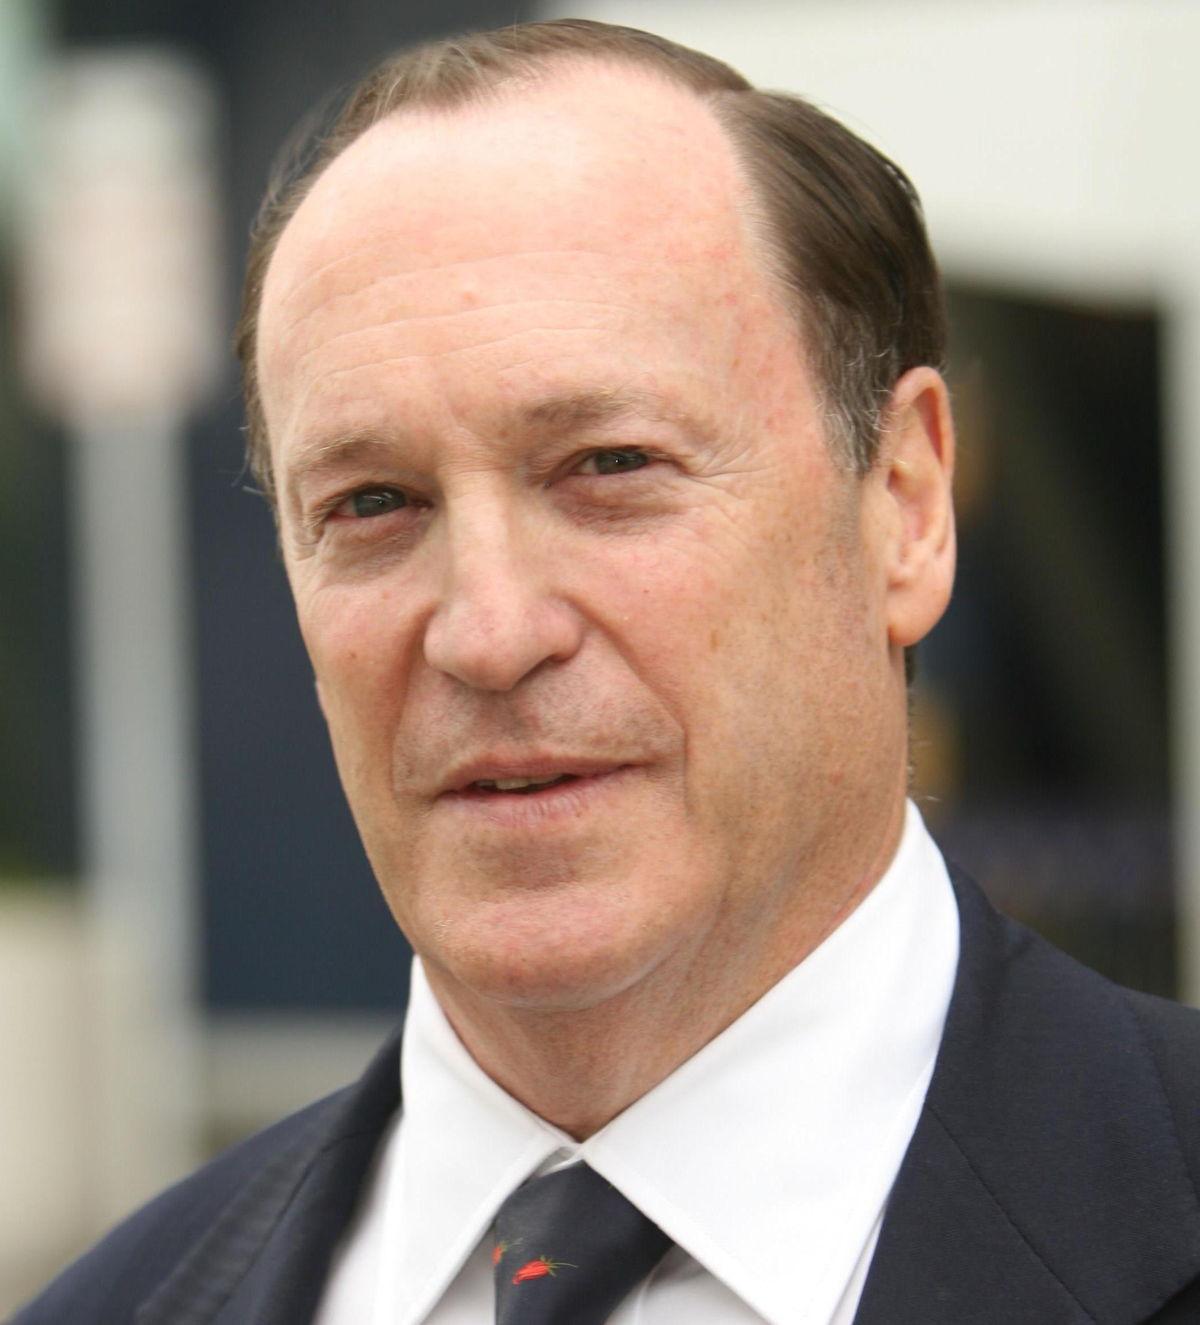 Steven Brill, co-founder of NewsGuard